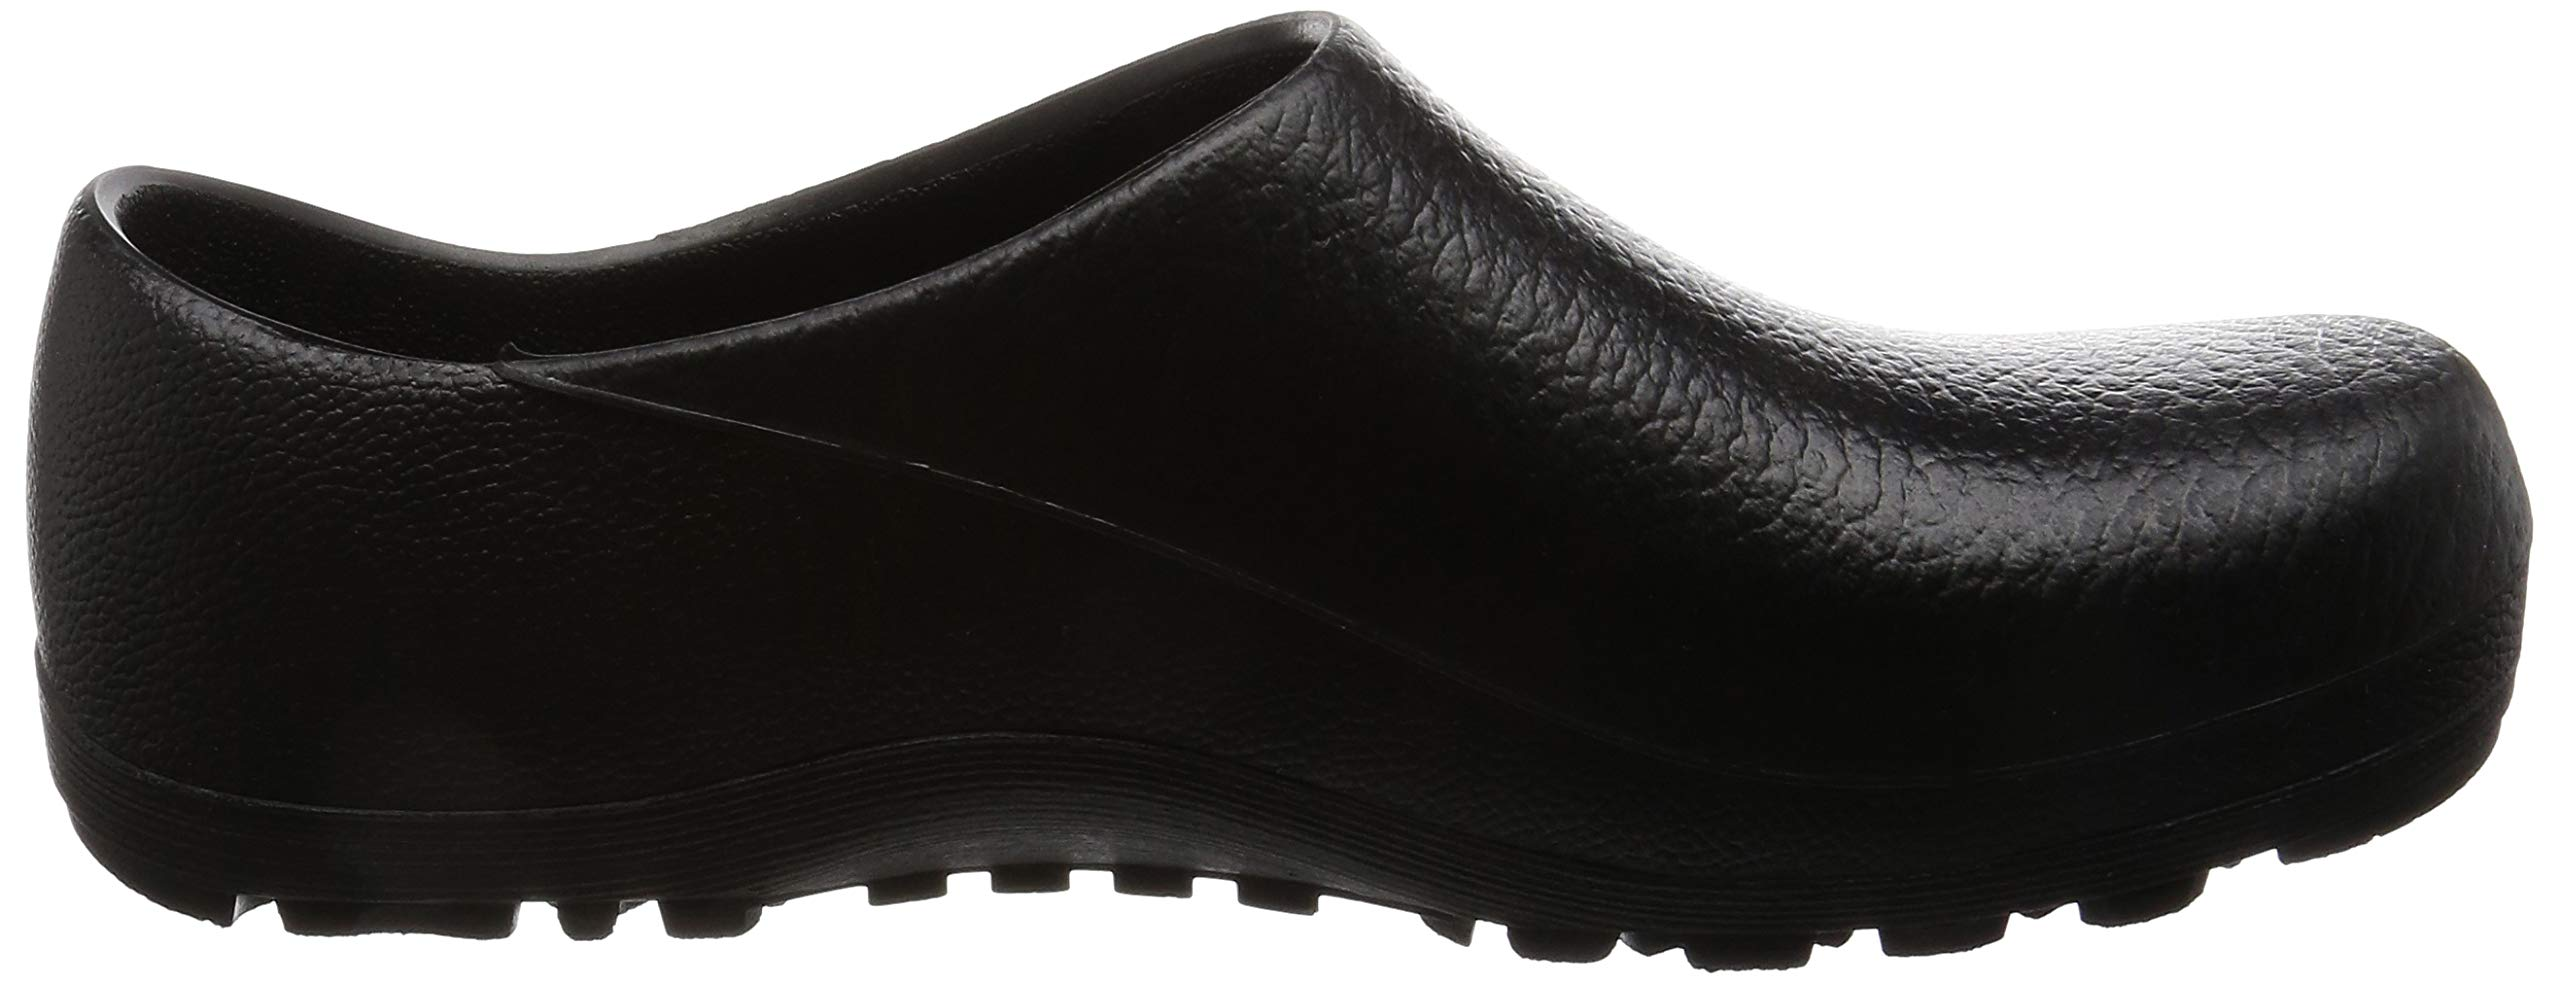 61839f206dacc Birkenstock Professional Unisex Profi Birki Slip Resistant Work Shoe ...